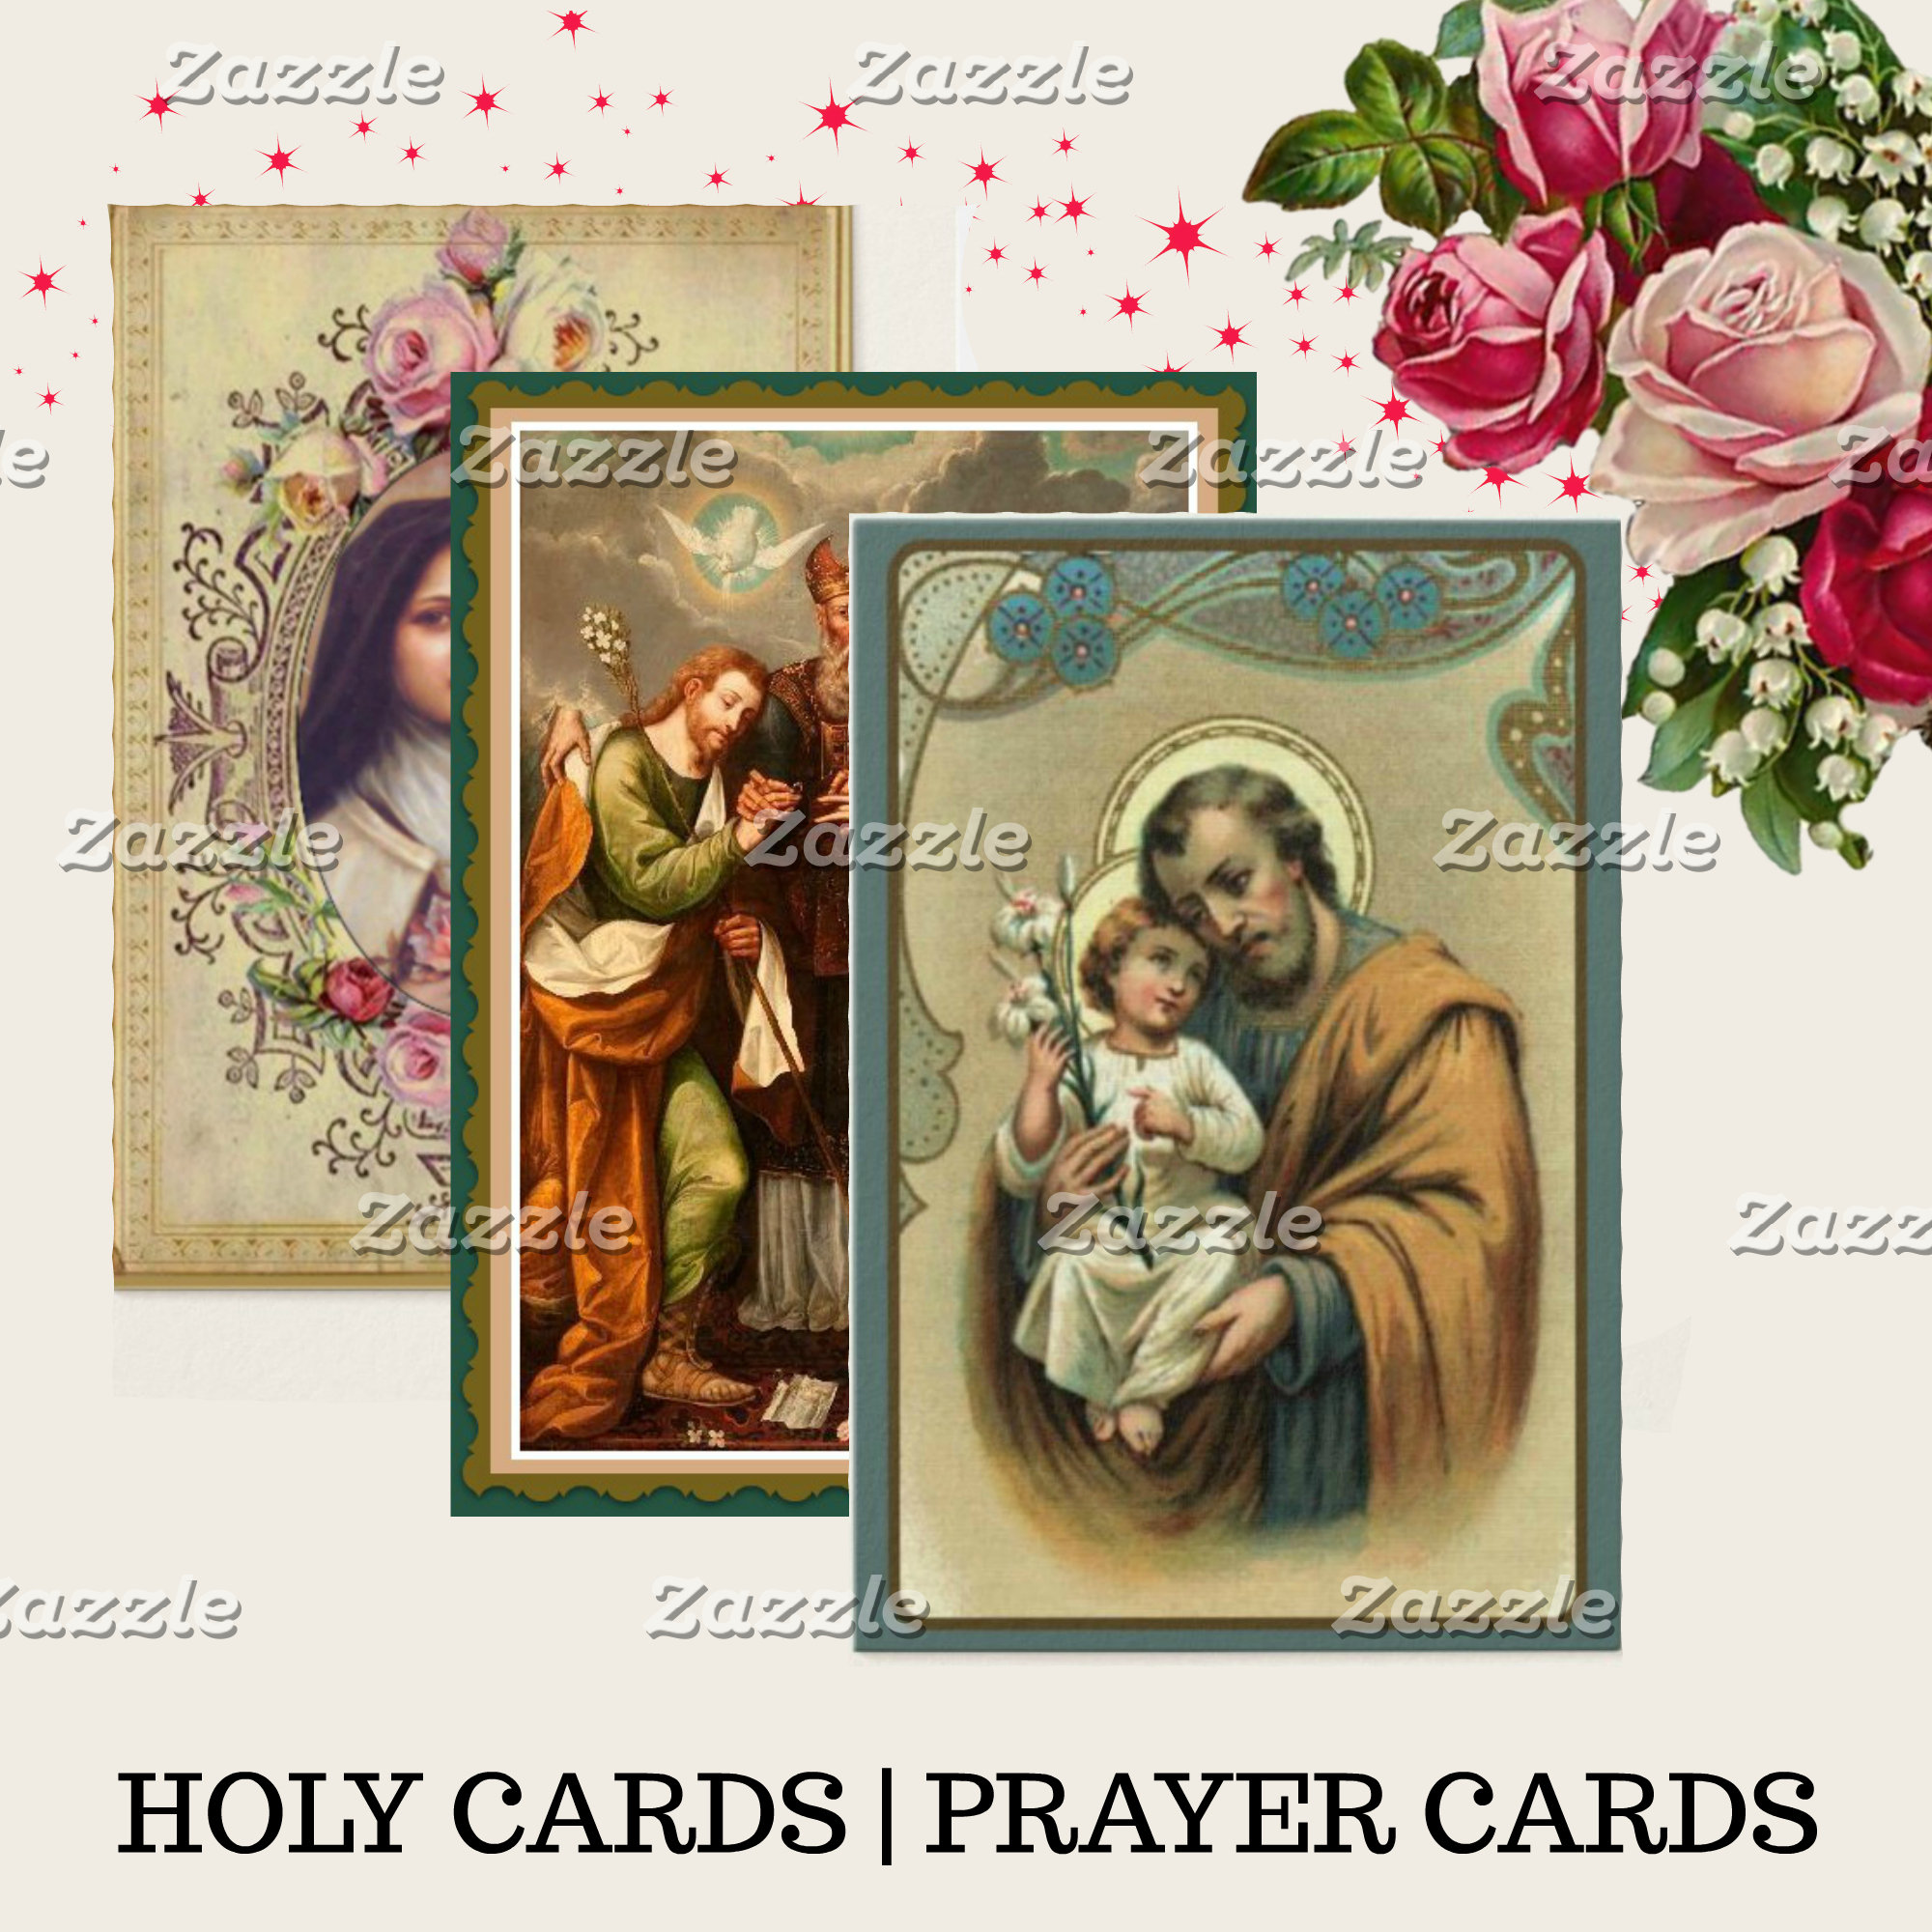 HOLY CARDS | PRAYER CARDS